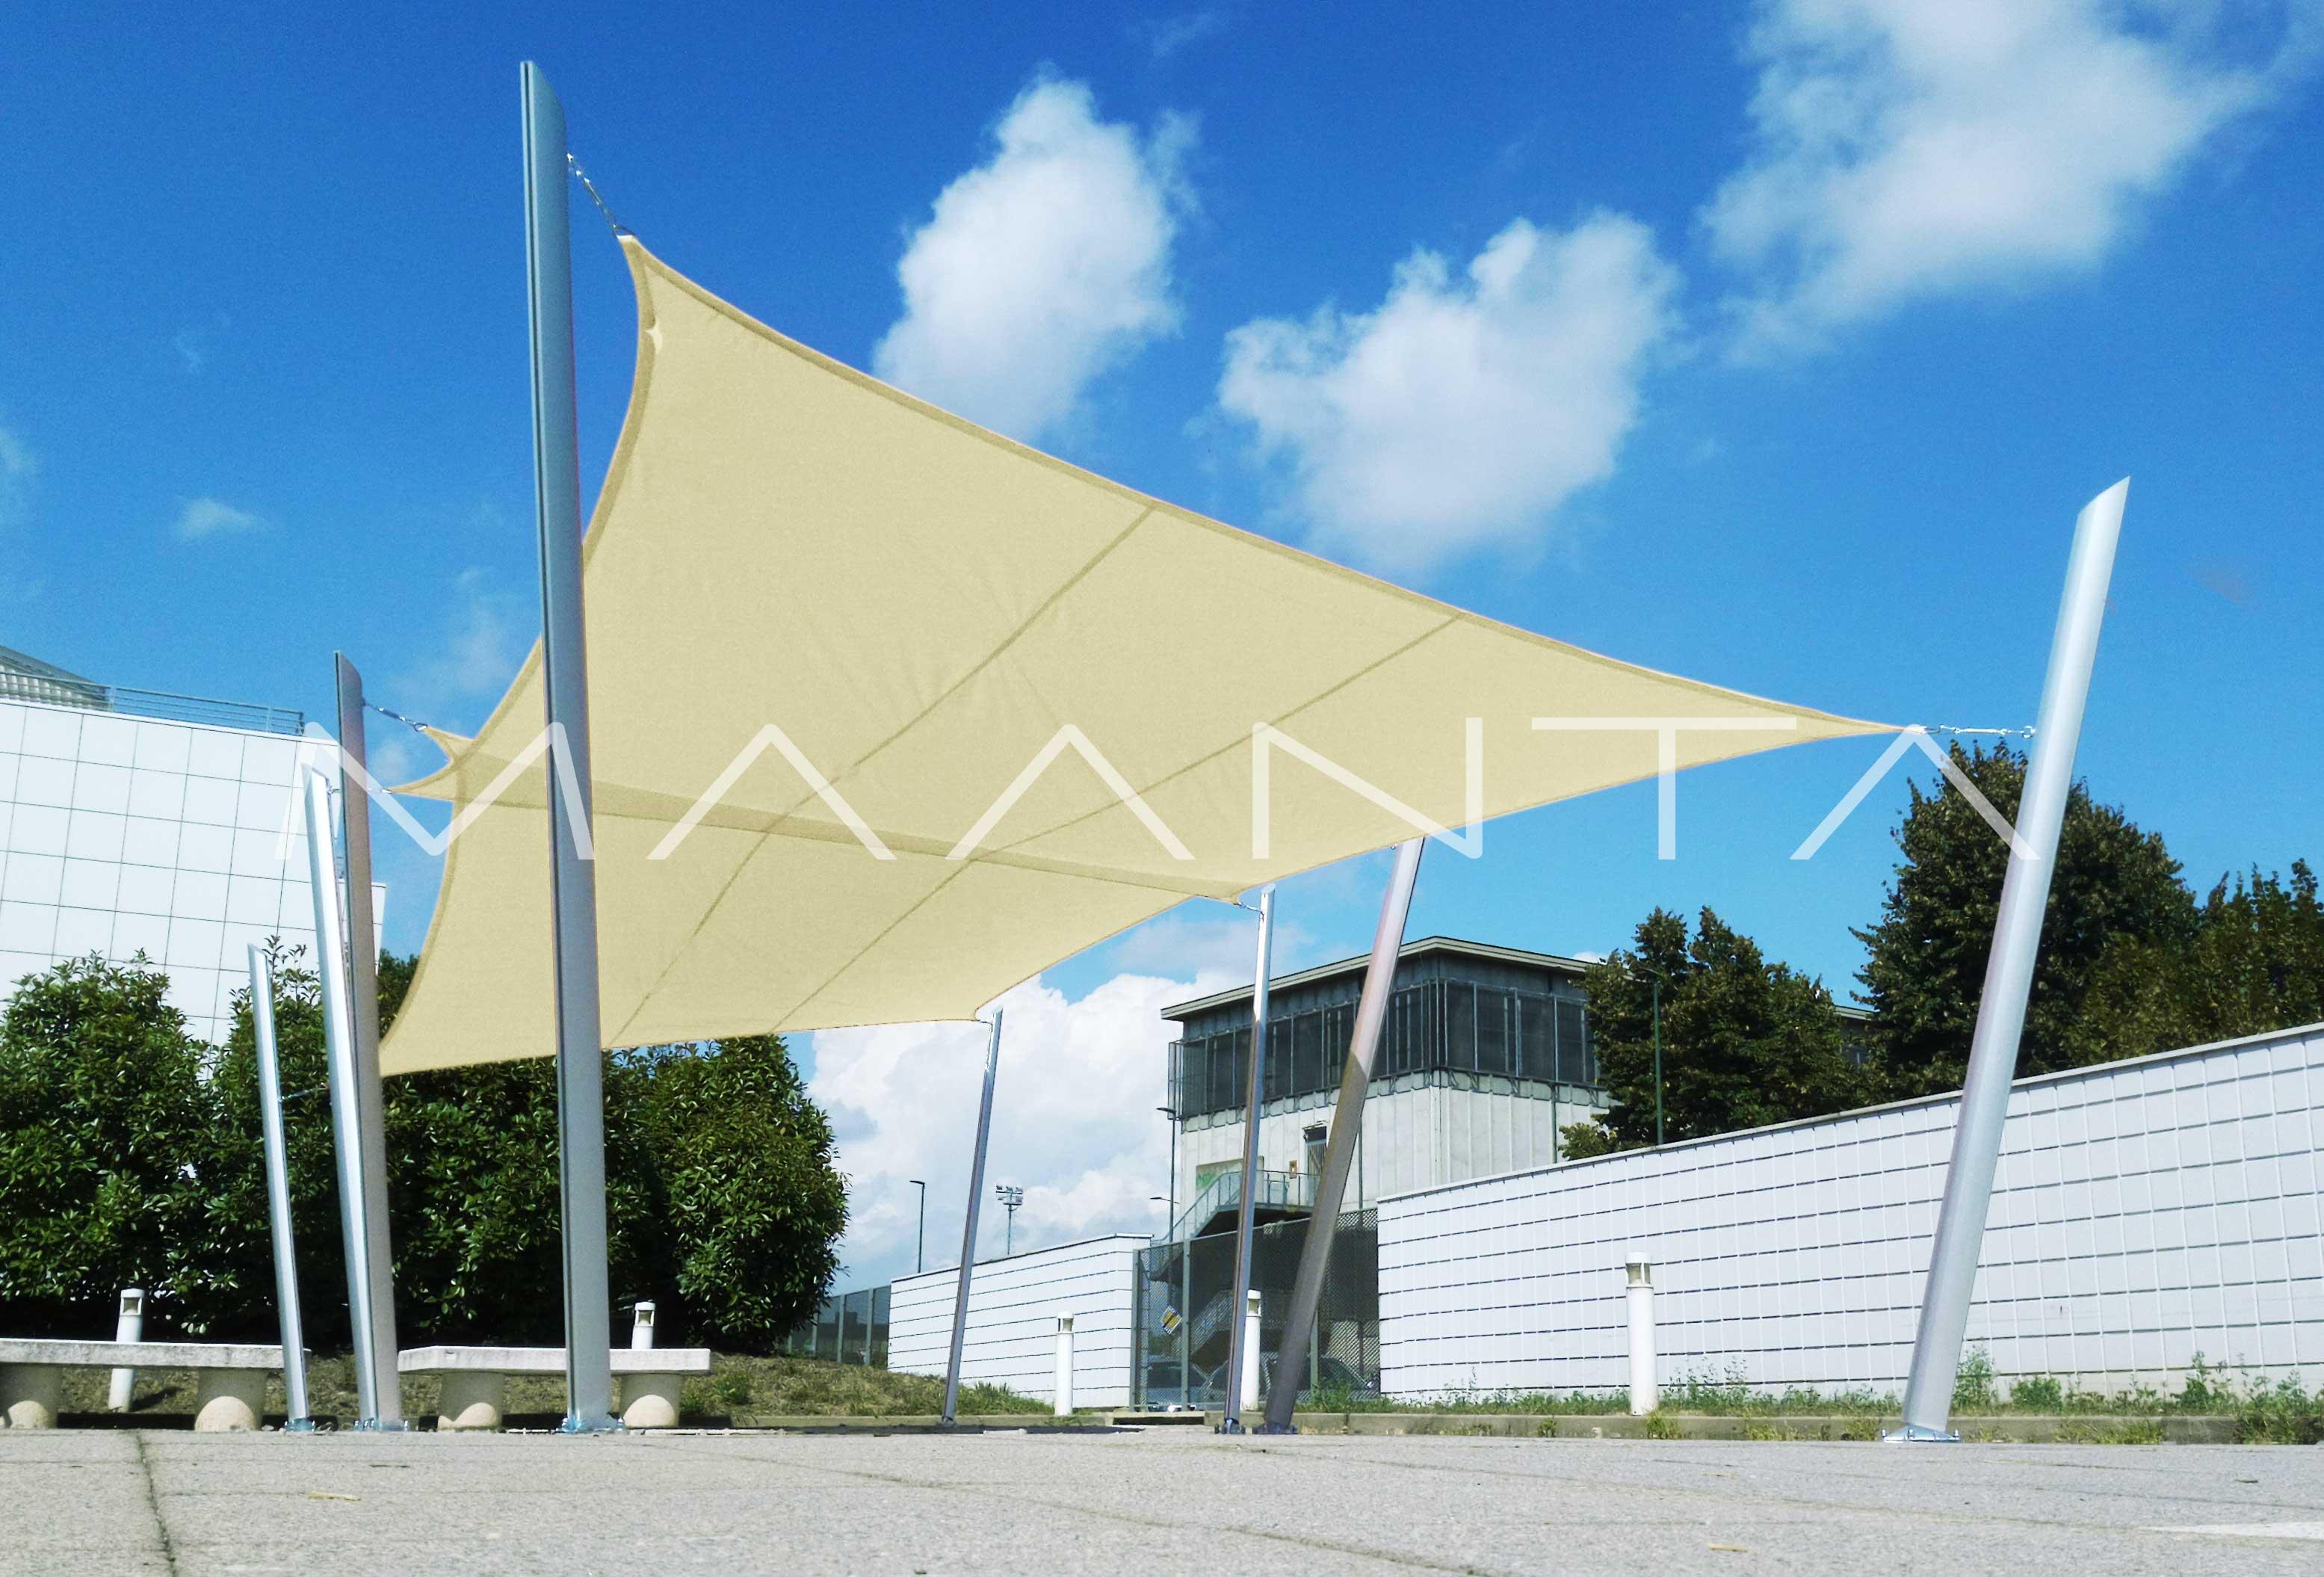 Easyshade vela impermeabile 160gr a 4 lembi maanta for Tenda a vela rettangolare